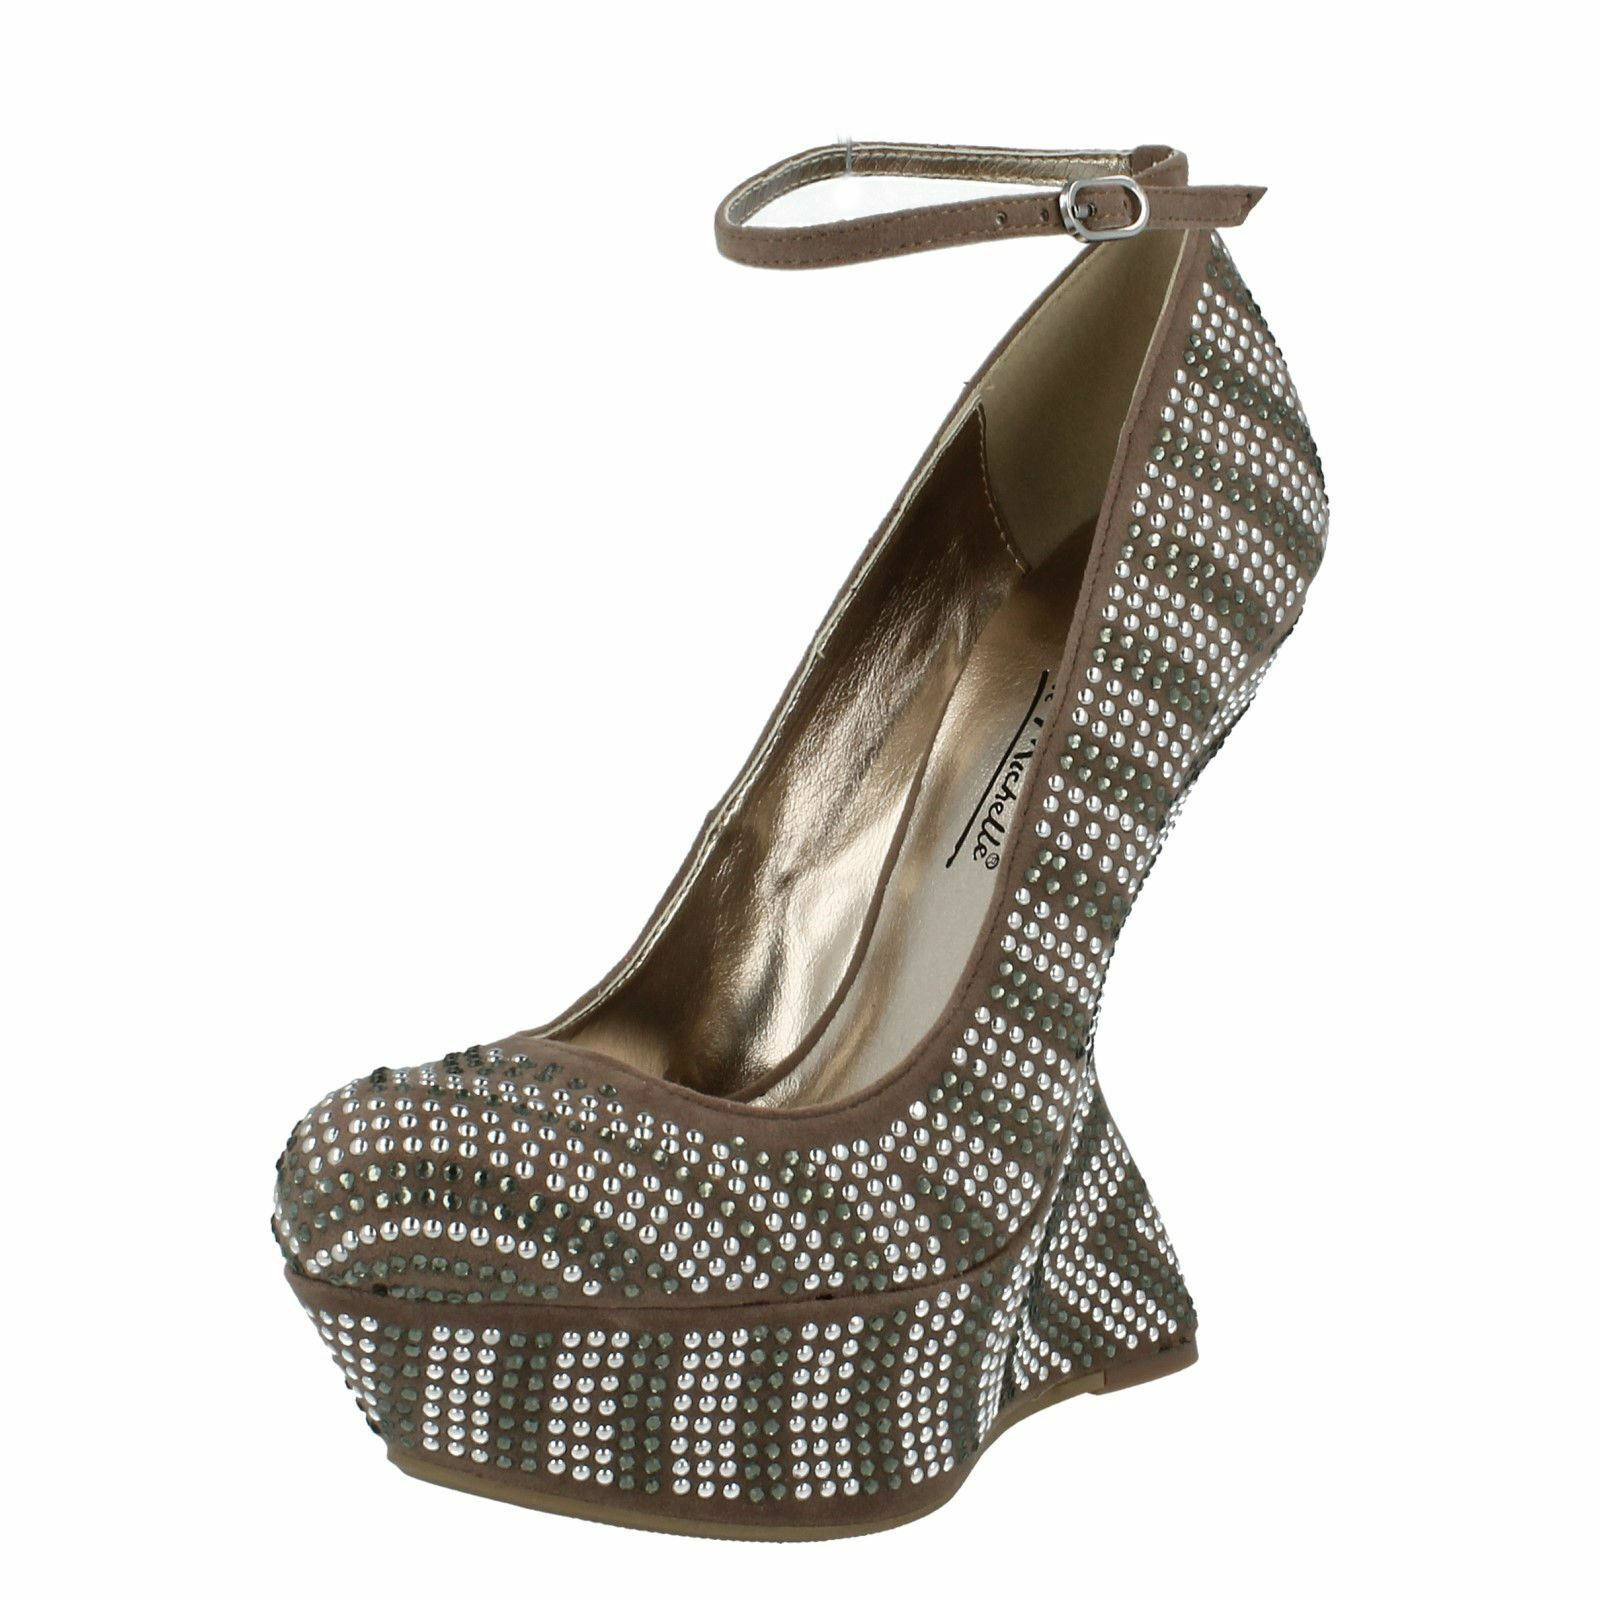 Moda jest prosta i niedroga Anne Michelle L2254 Nude Mujer Zapatos Tacón Alto Diamante (r59b)( Kett )